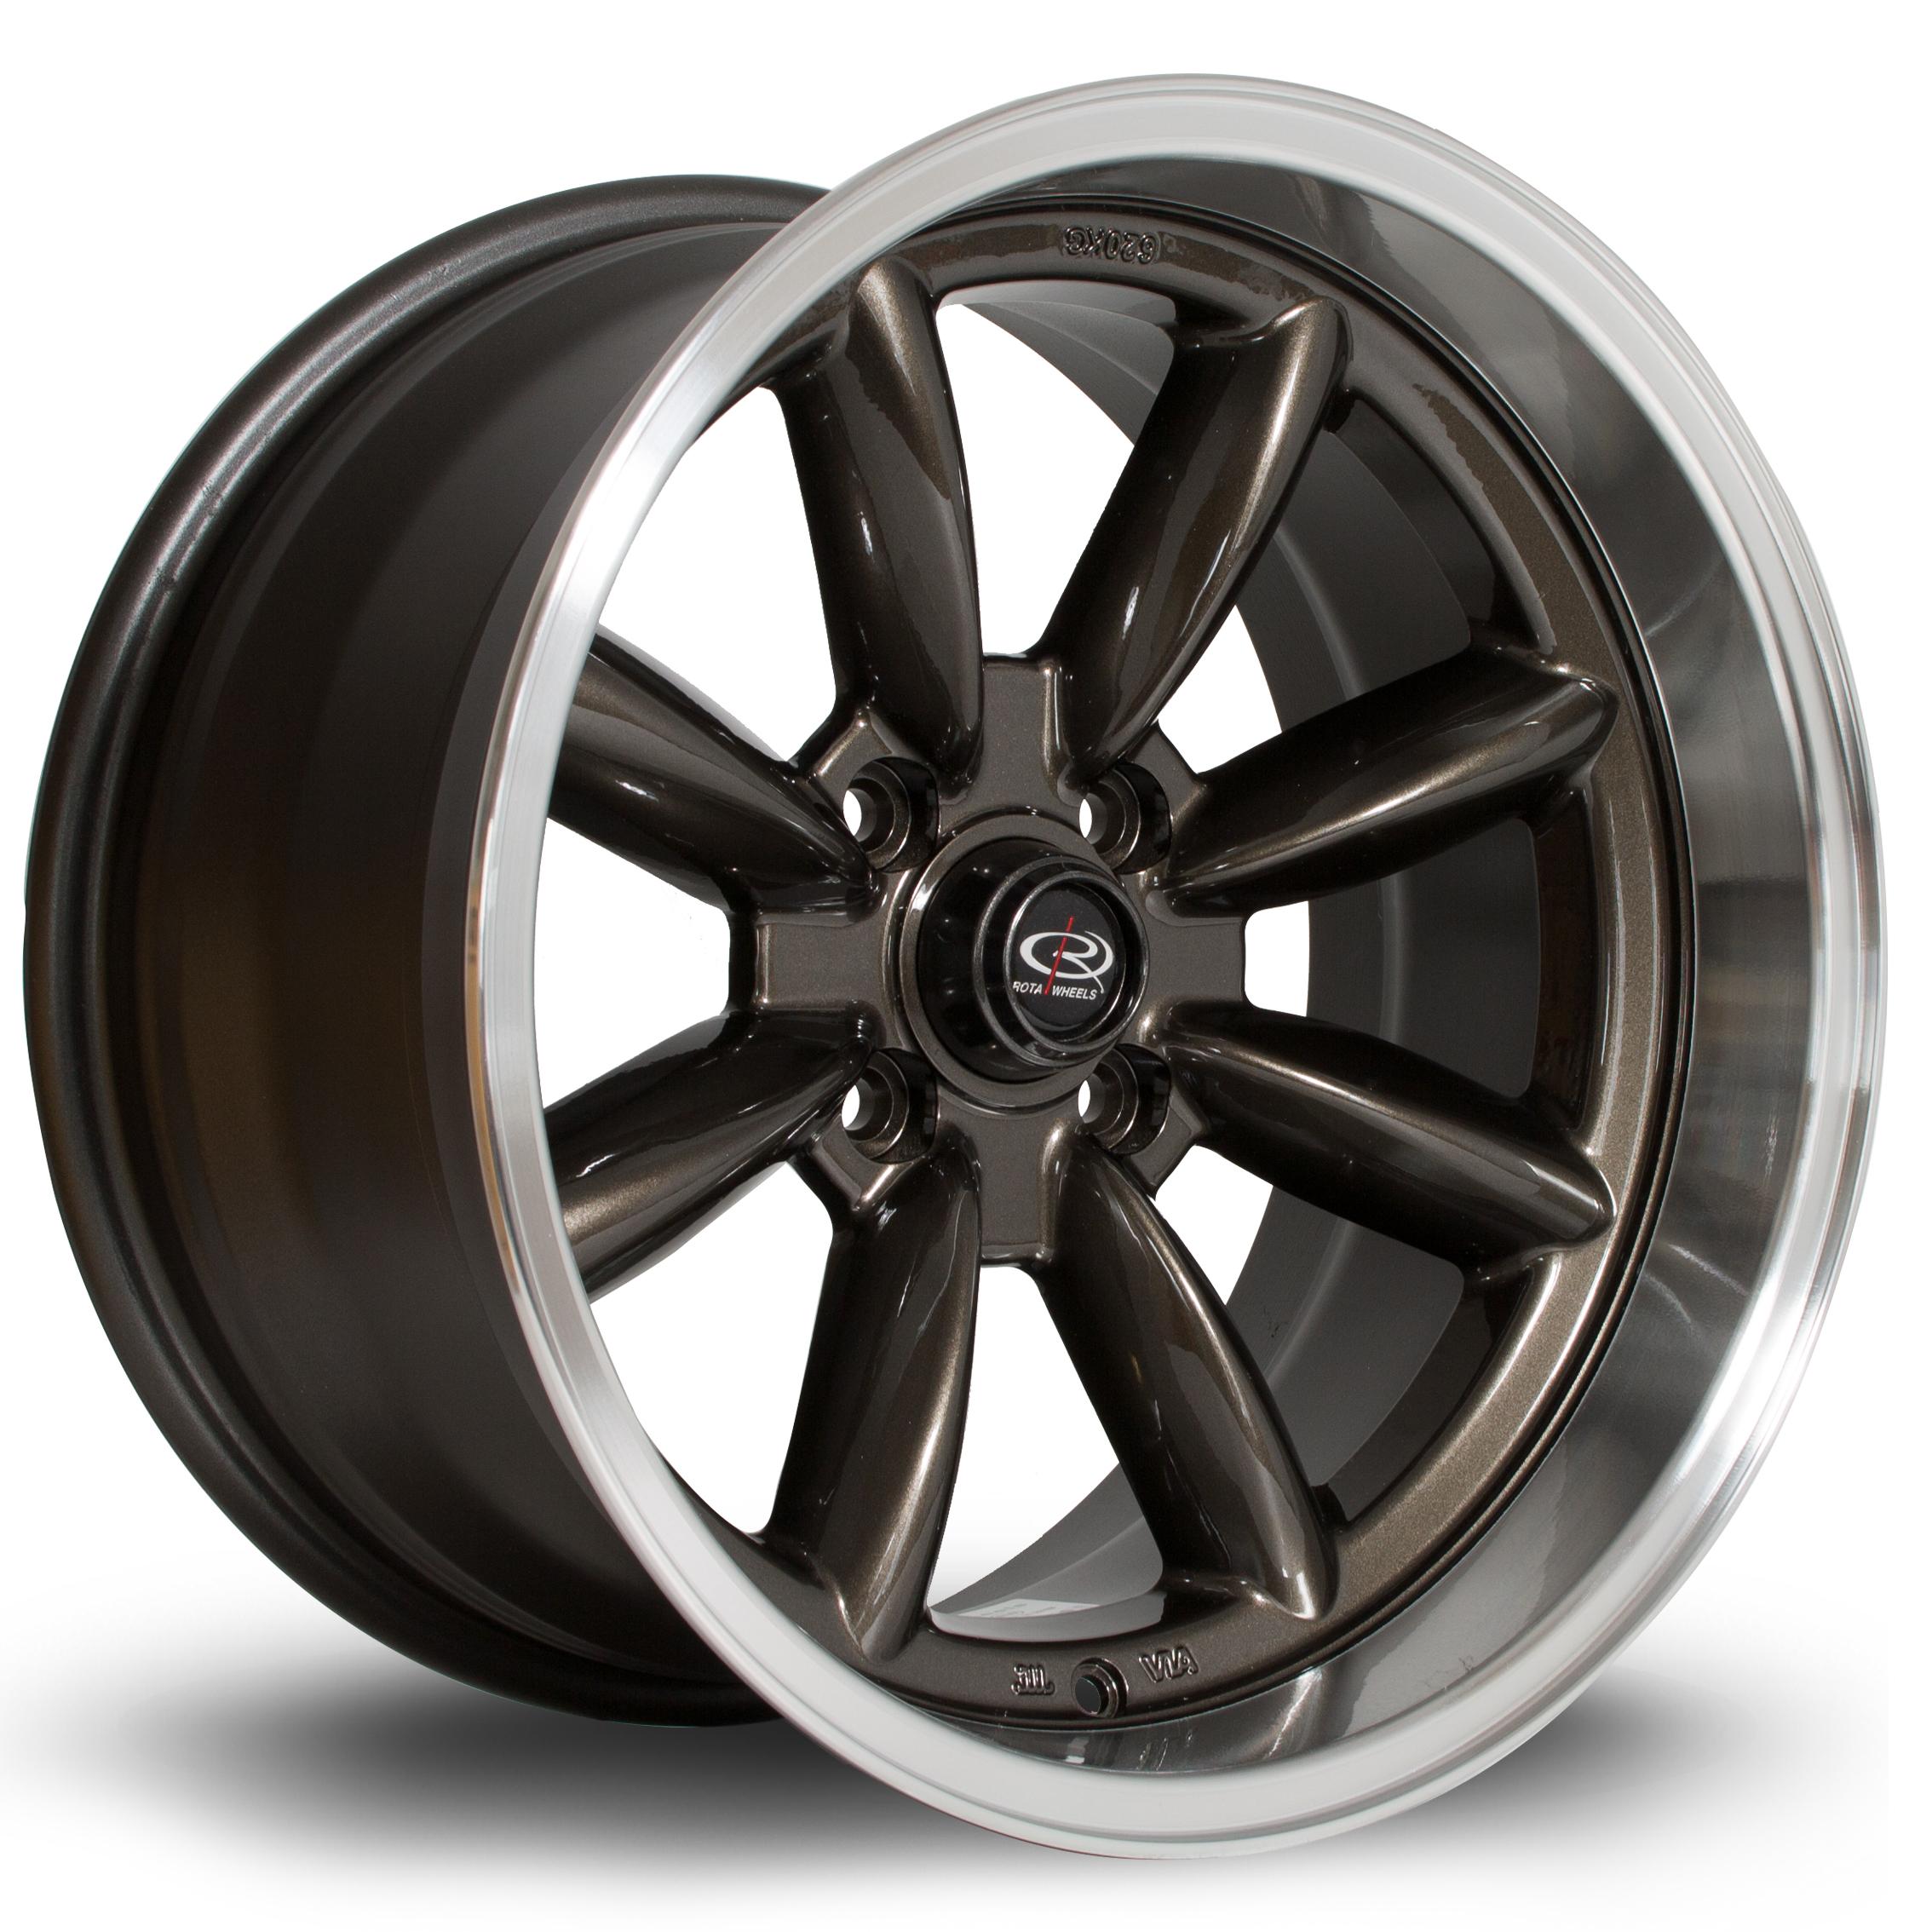 Rota RBX wheels